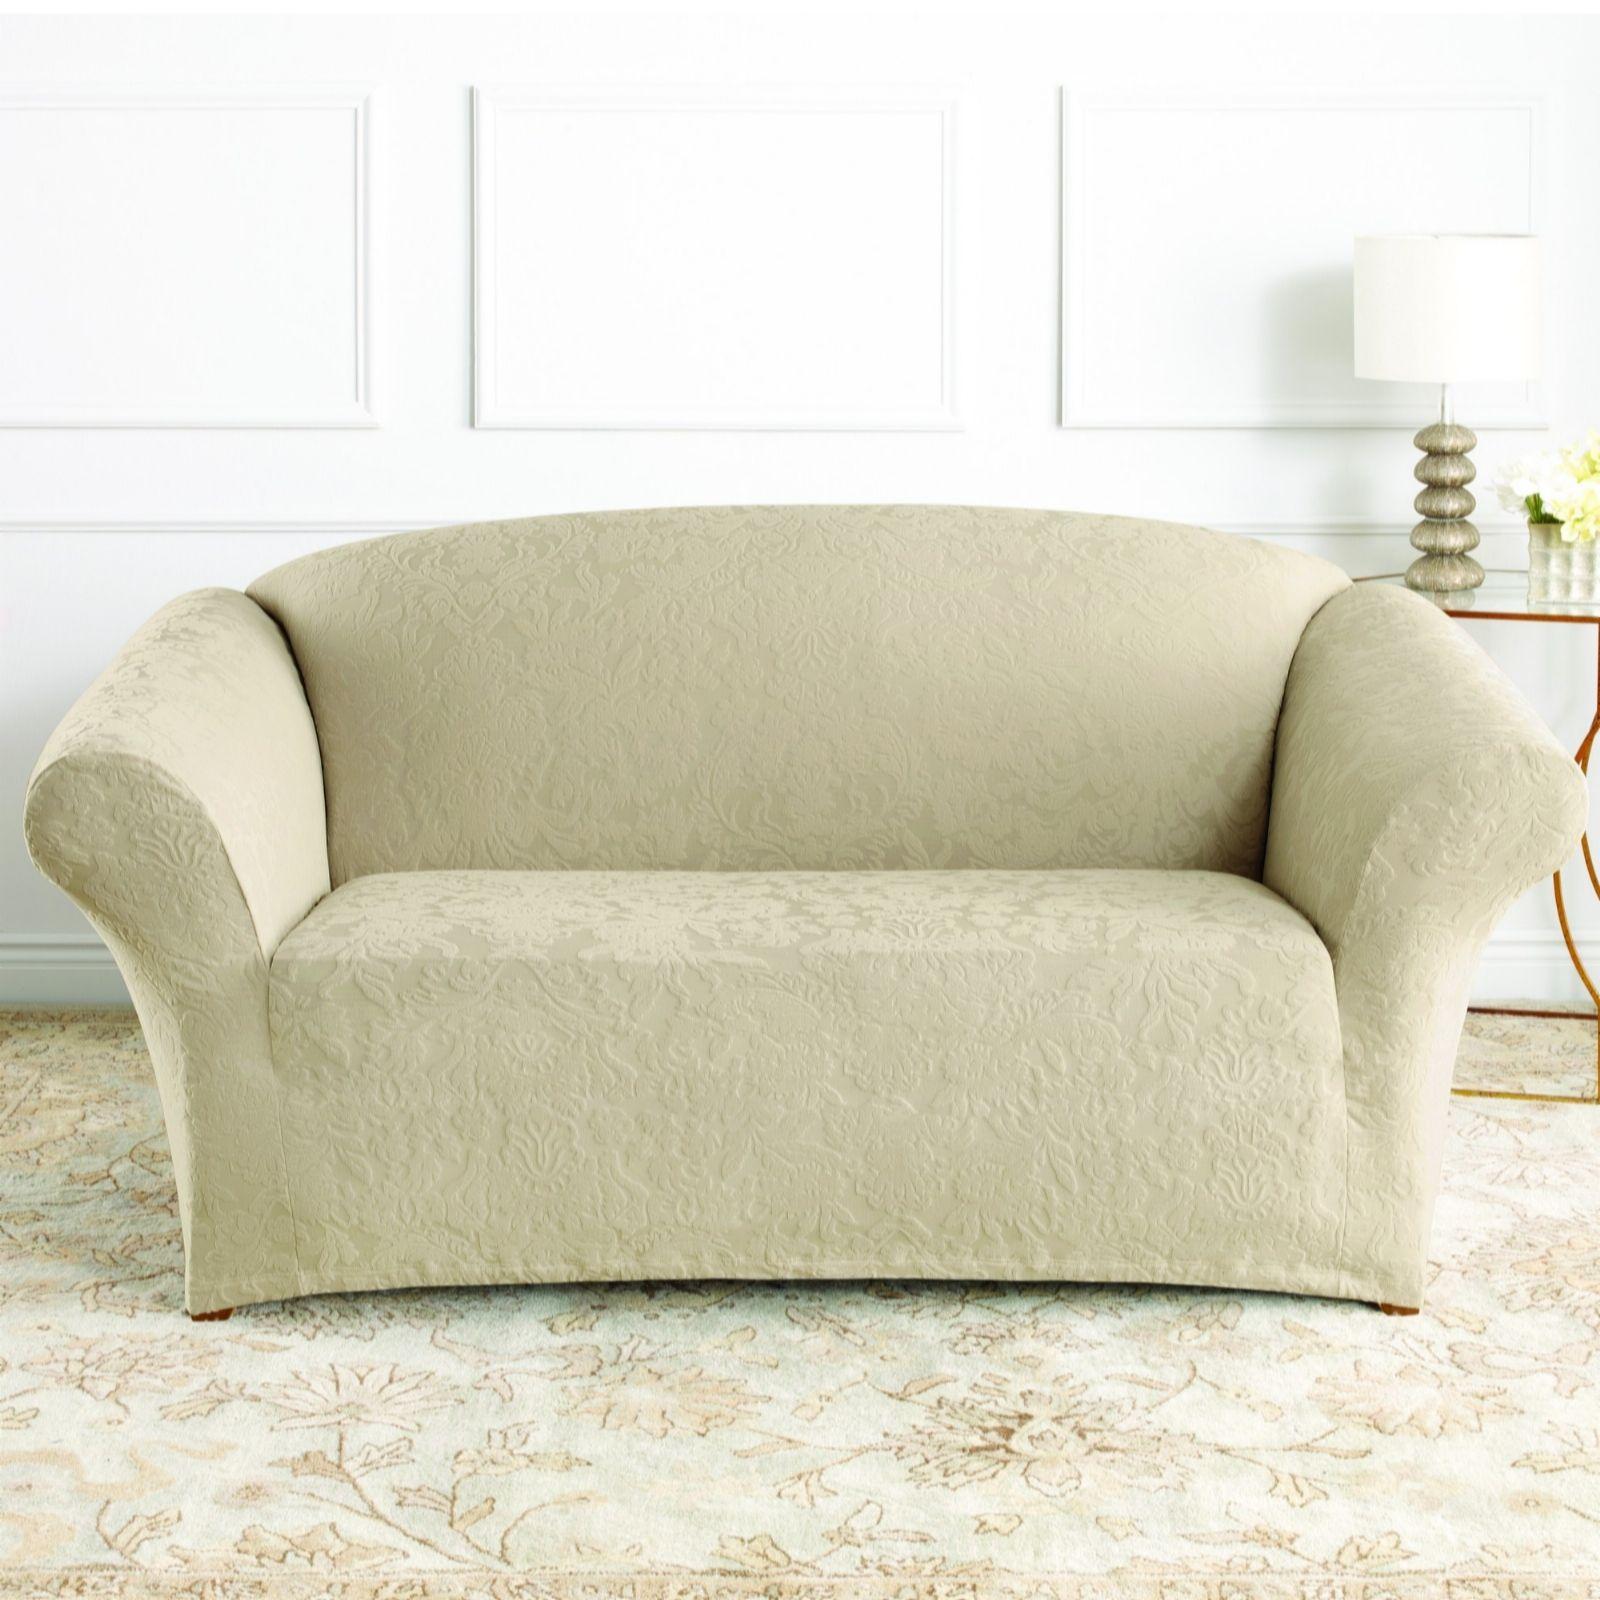 Damask Sofa Slipcover Sure Fit Stretch Jacquard Damask Box